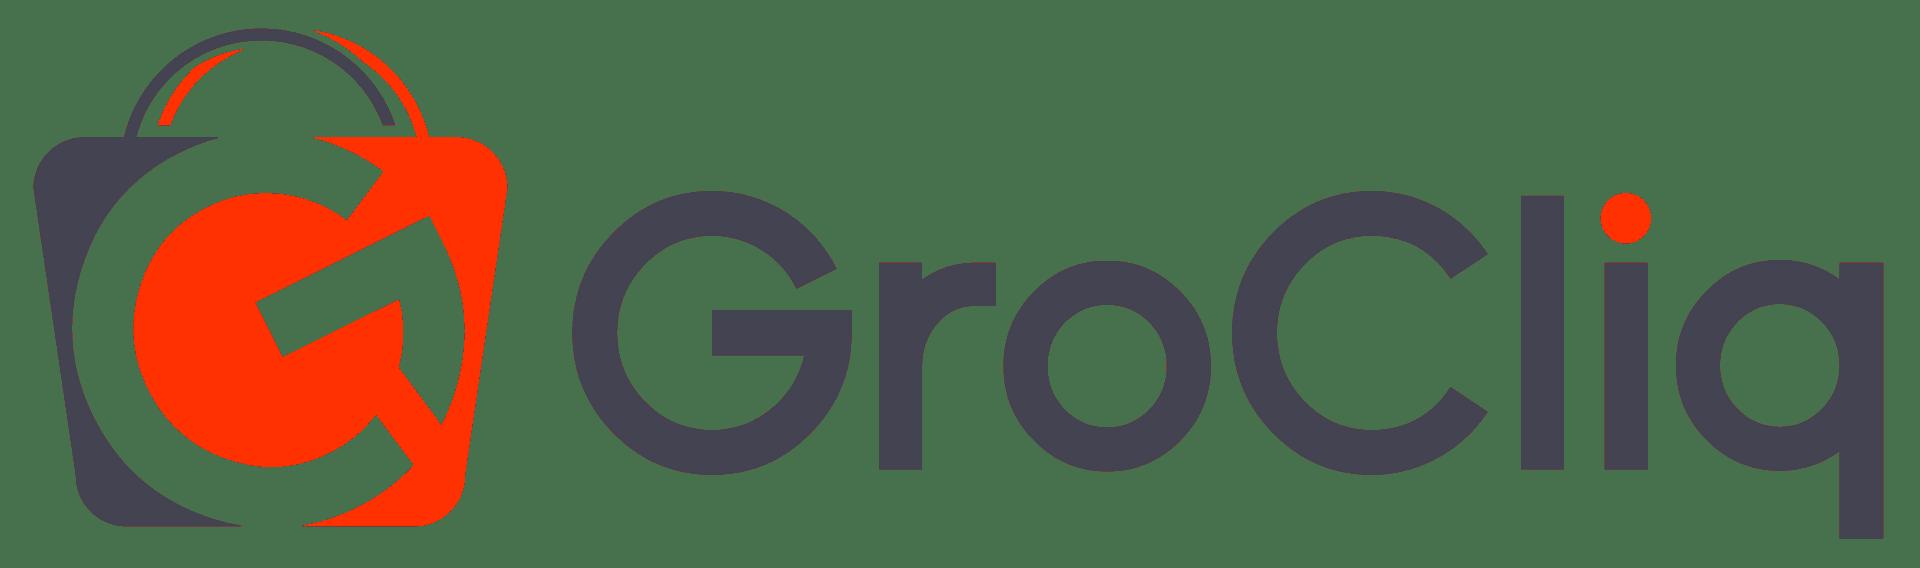 GroCliq | Online Grocery Shopping logo